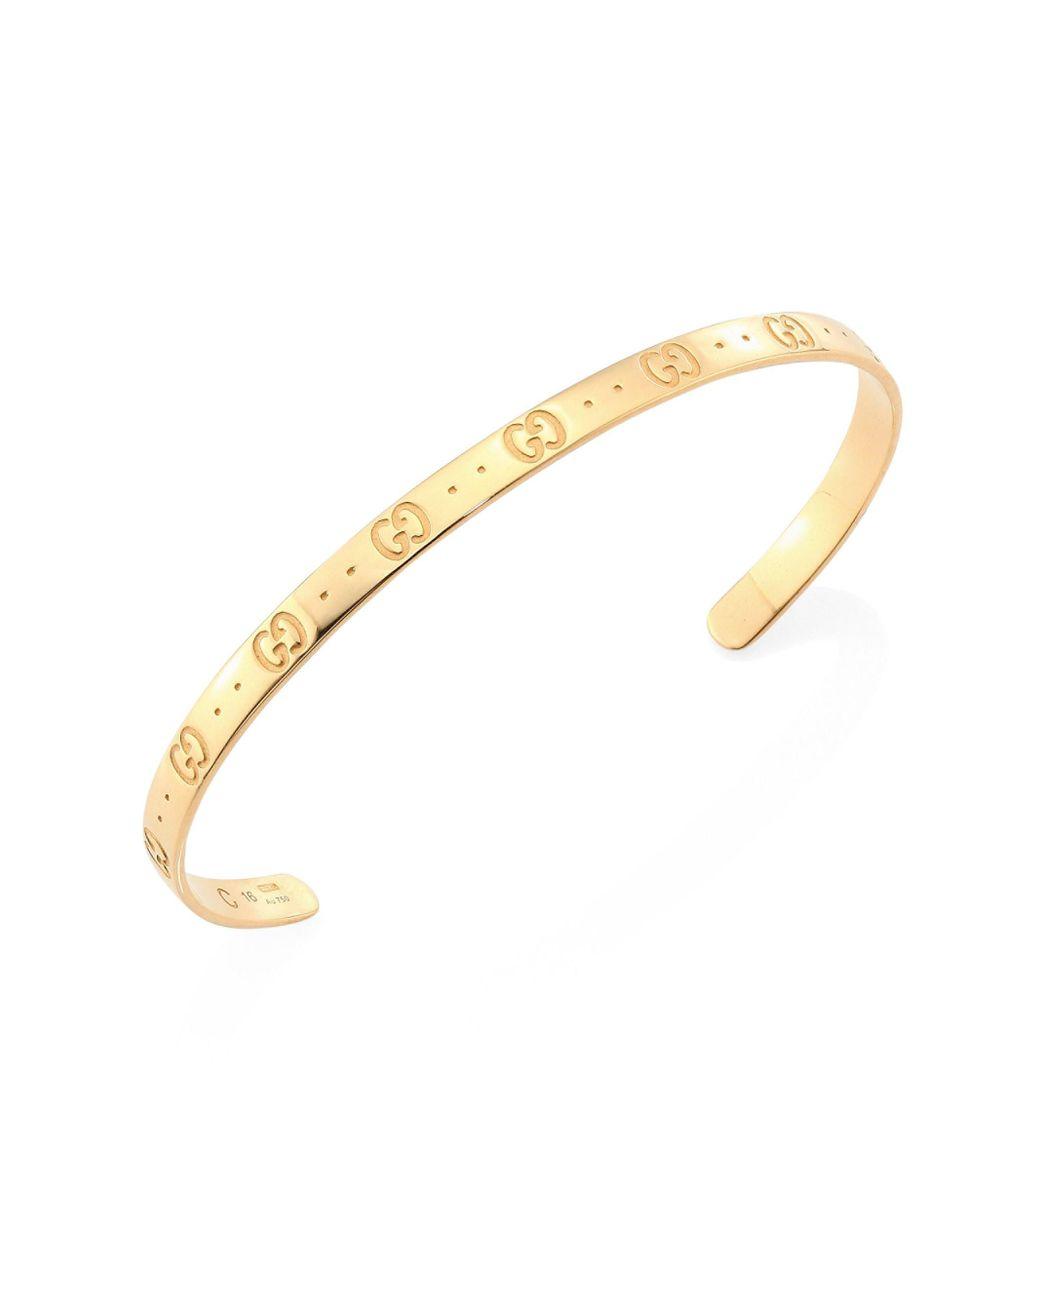 f64e4fa28 Gucci Icon 18k Yellow Gold Bangle Bracelet in Metallic - Lyst